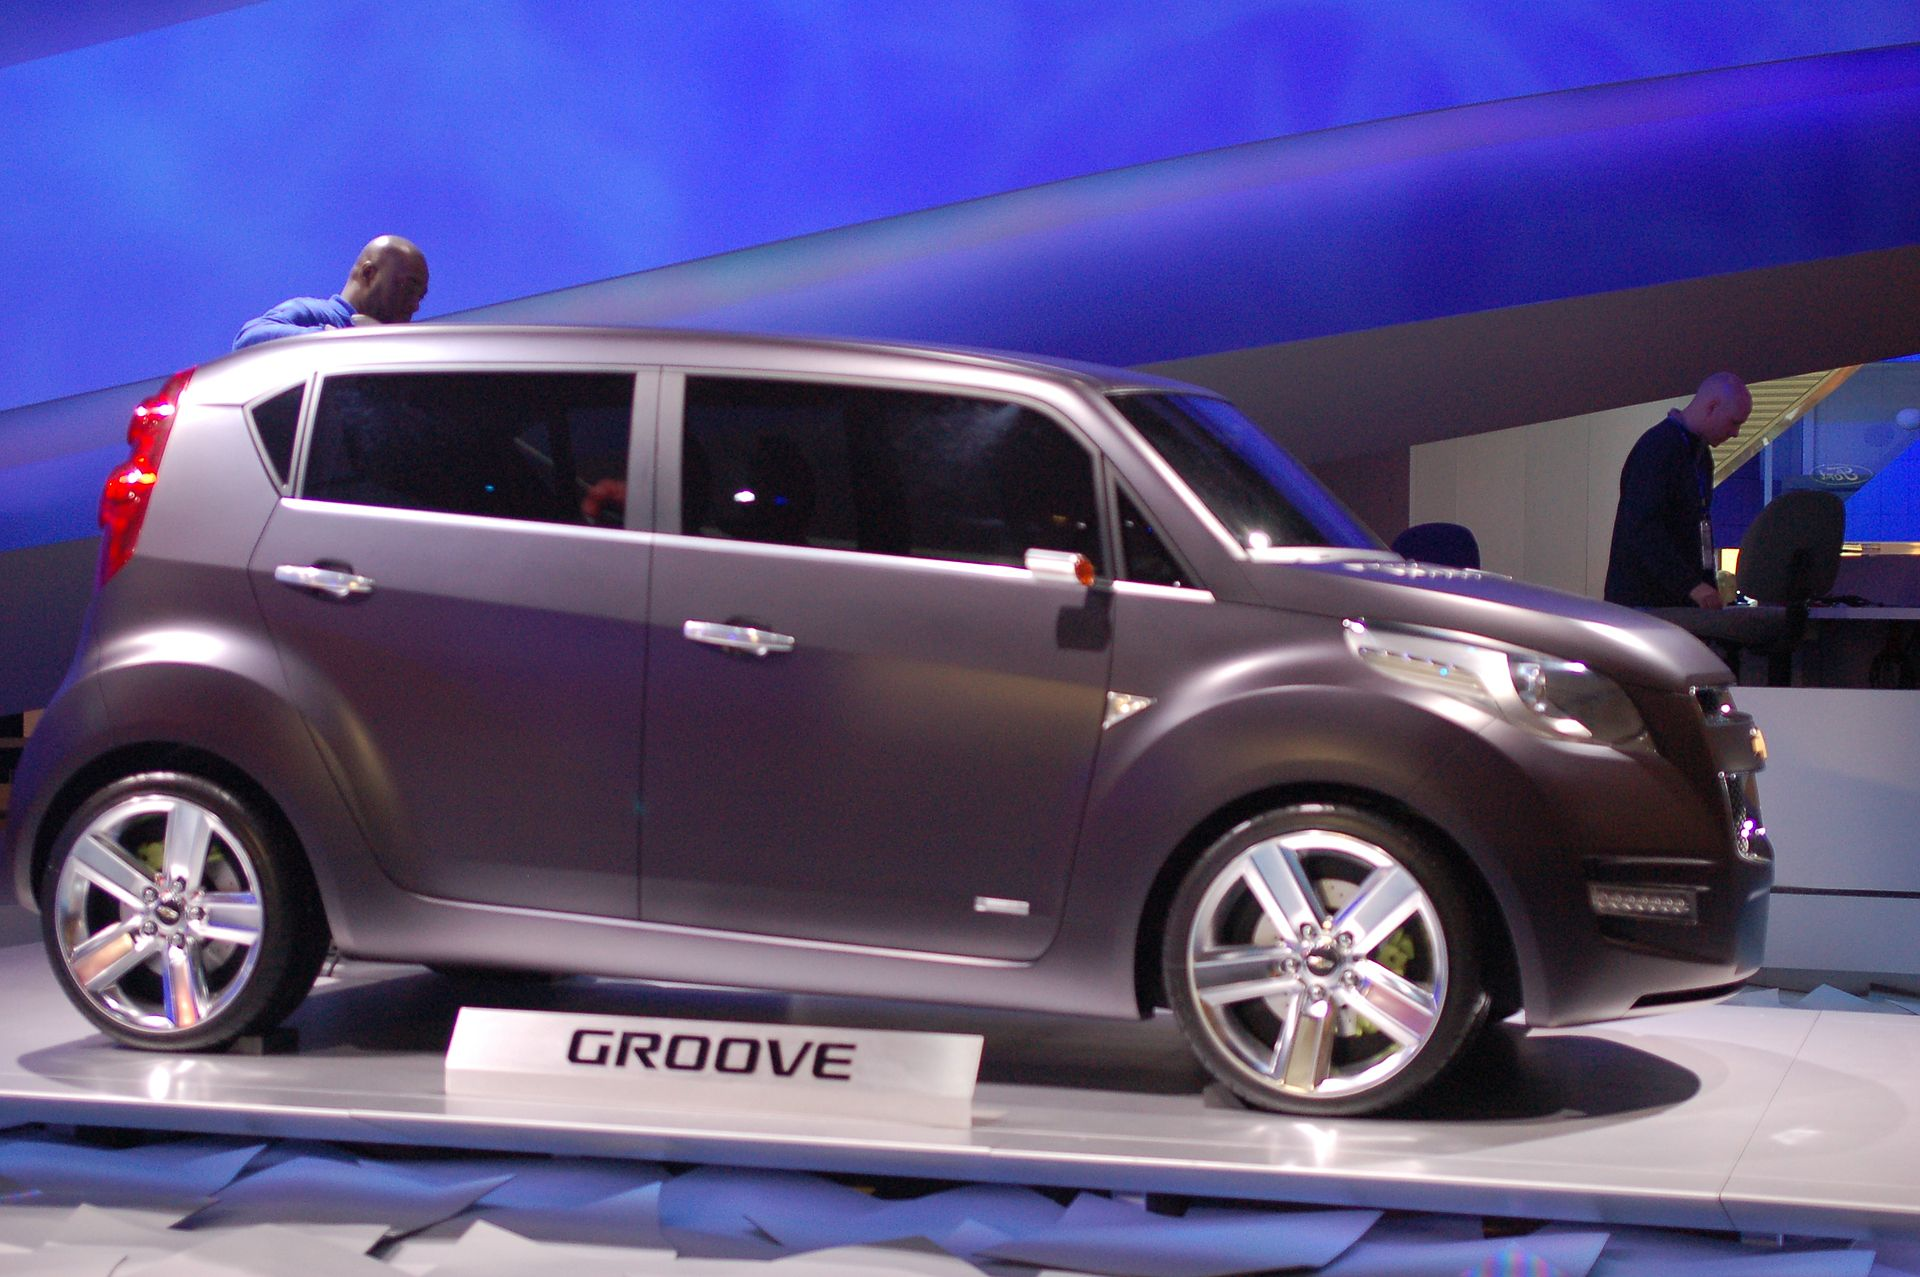 Chevrolet Groove - Wikipedia